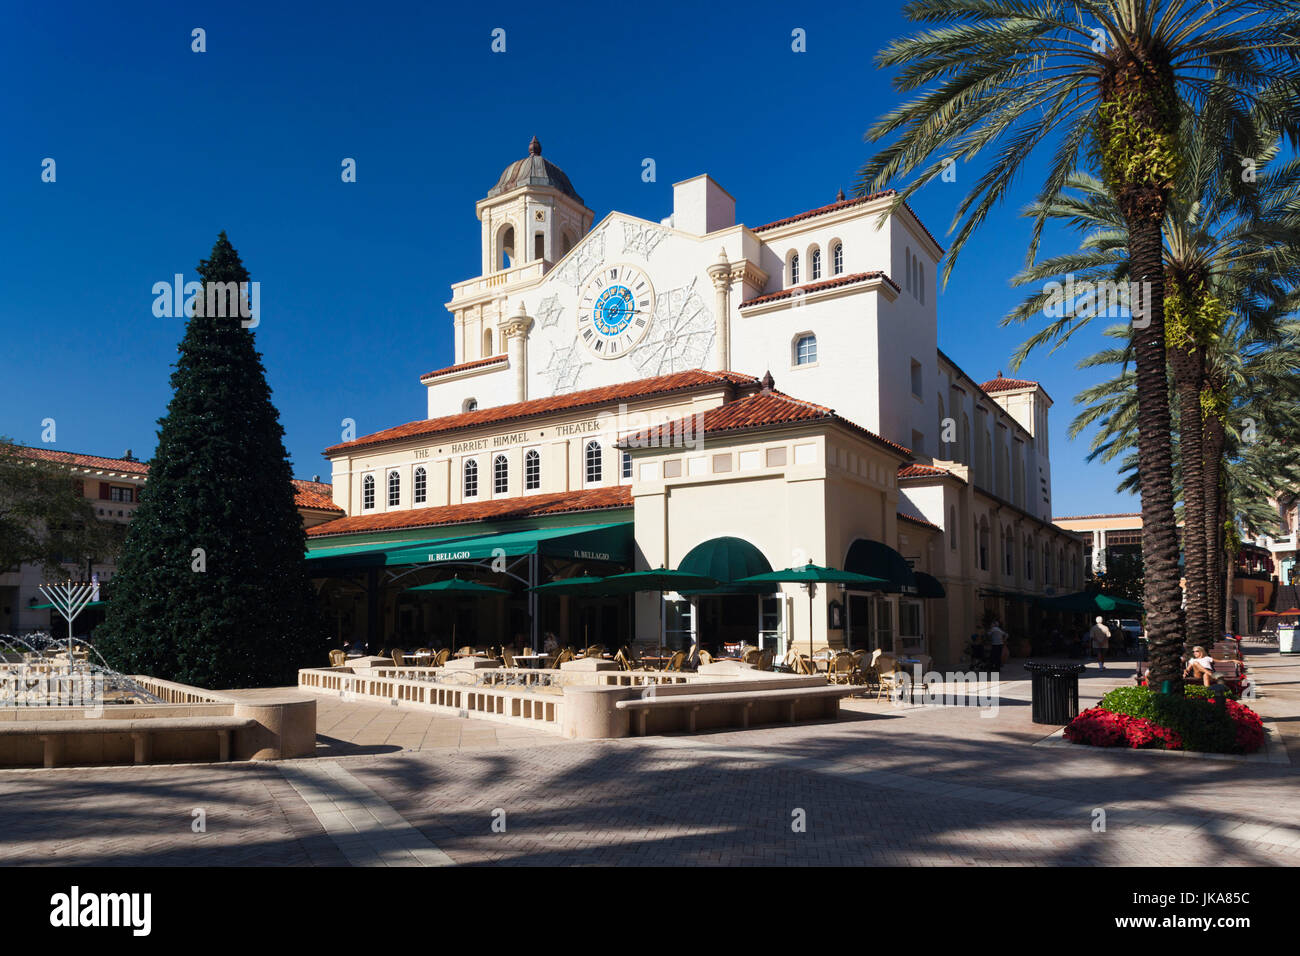 USA, Miami, West Palm Beach, City Place Mall, Harriet Himmel Theater Stockbild